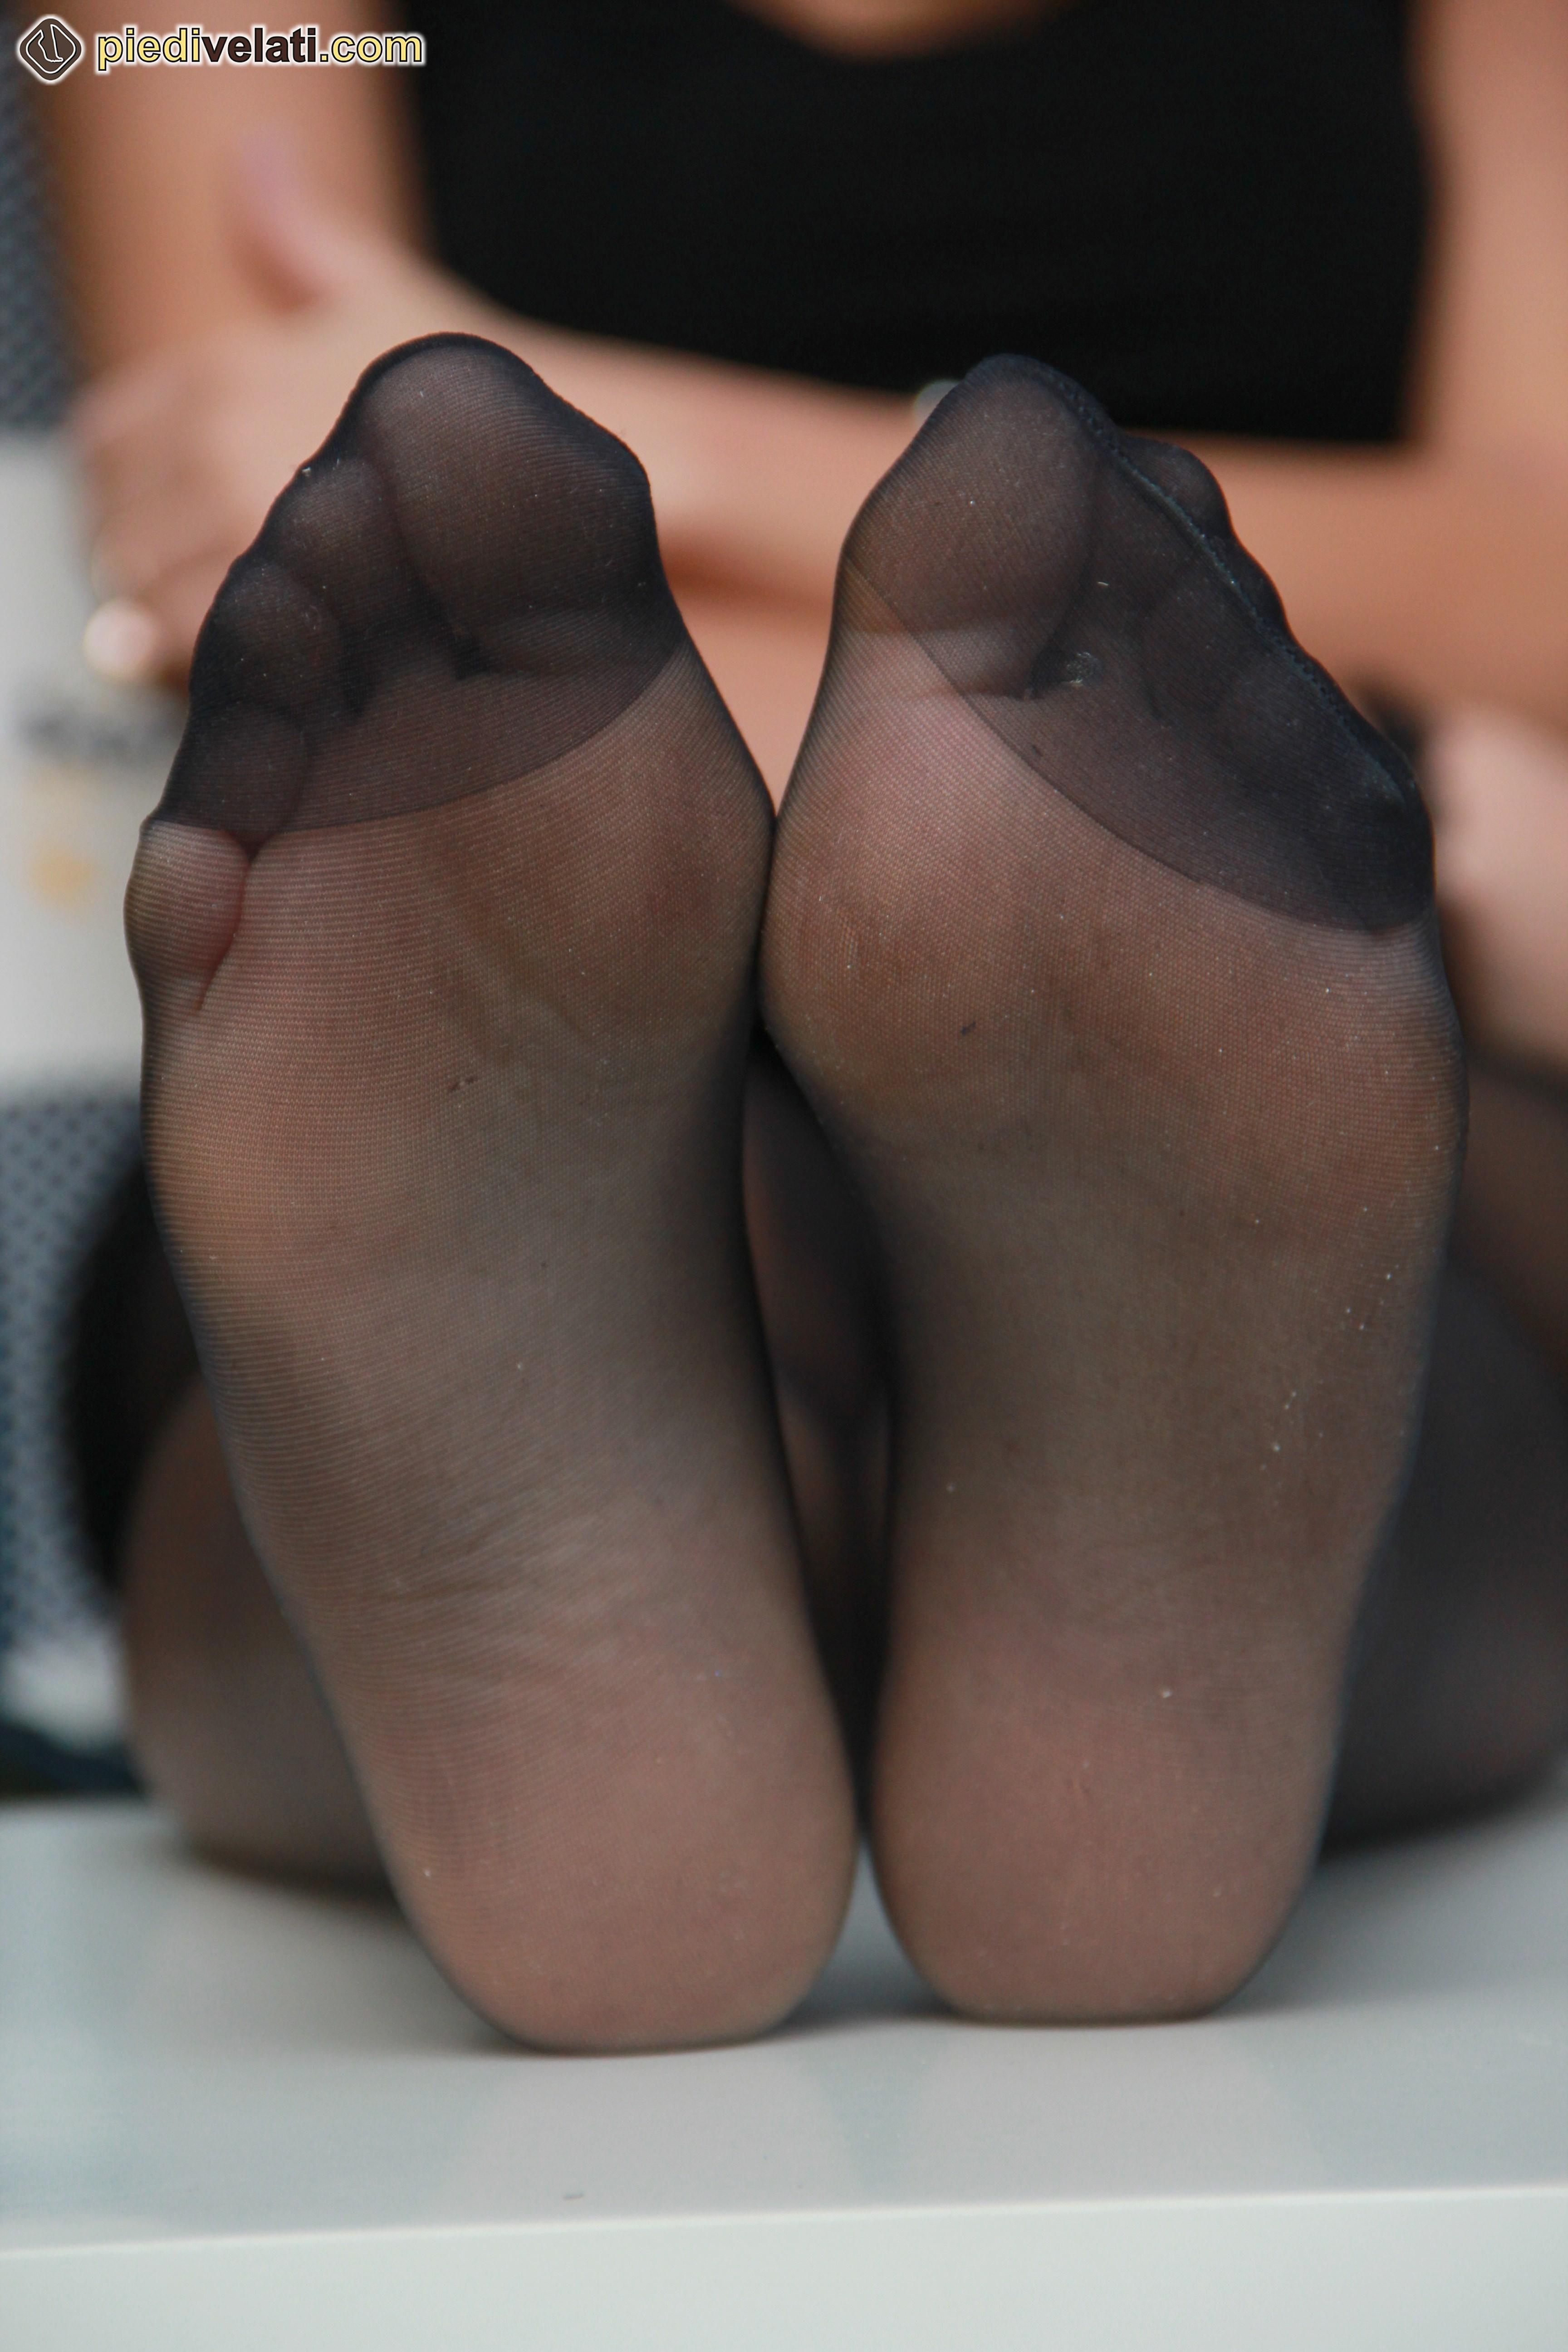 Nylon Feet Love Petra Xxxgandonline Pantyhose Hdbabes Sex Hq Pics